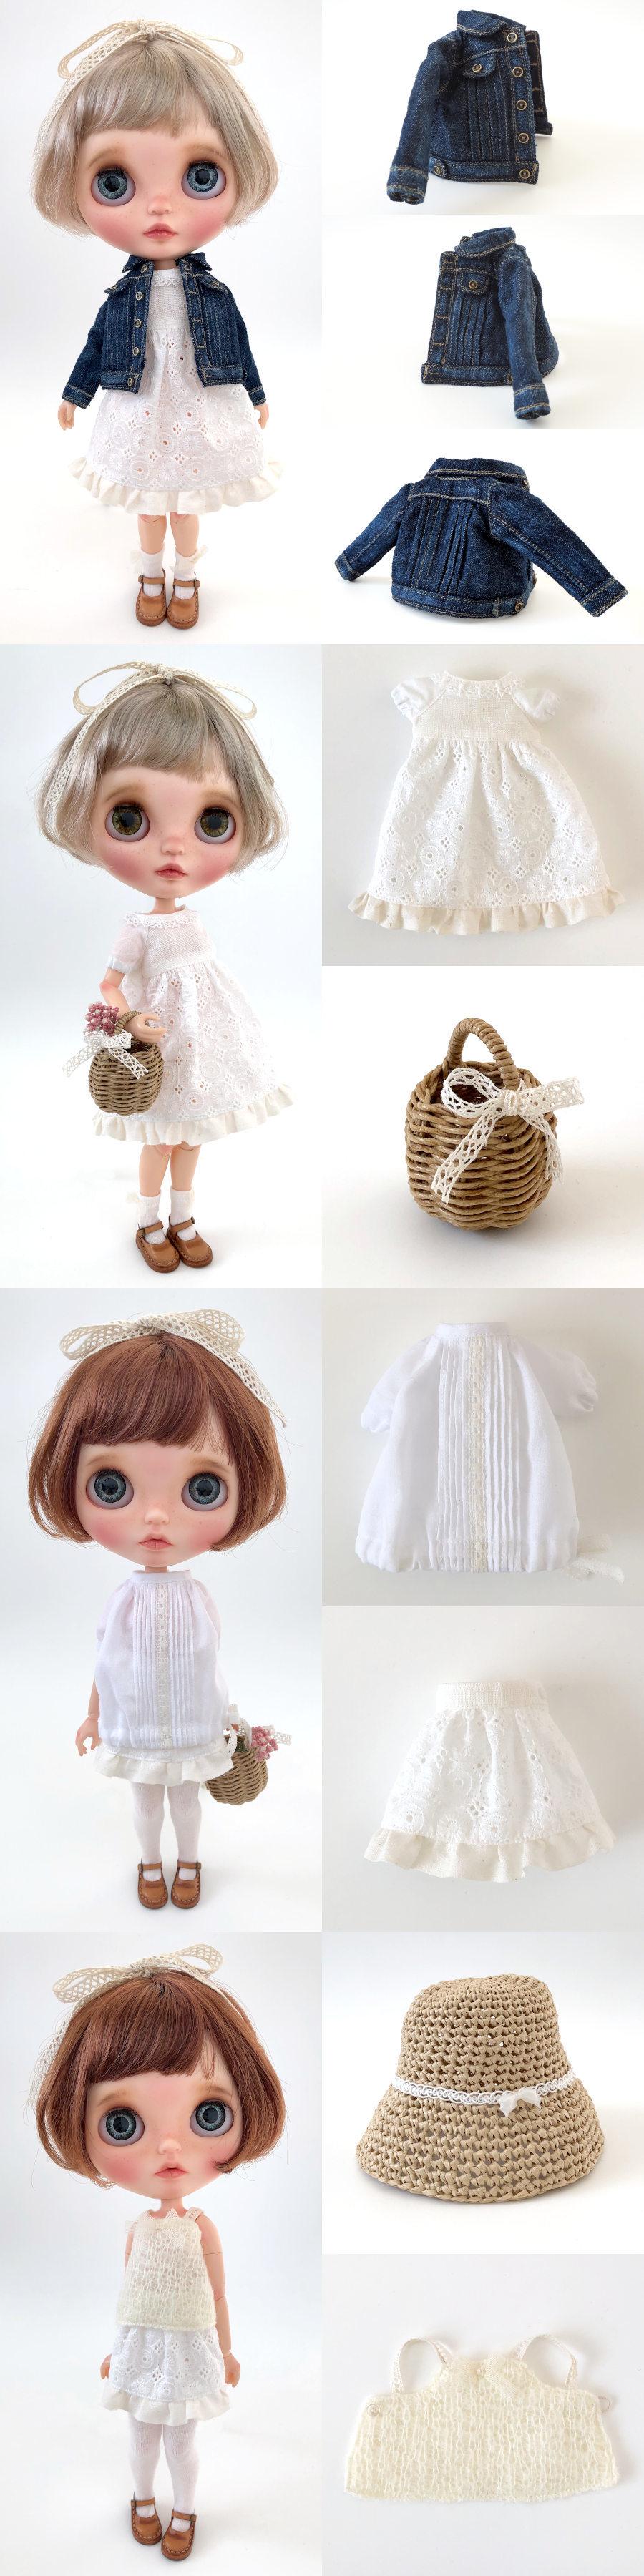 * lucalily * dolls clothes * Denim jacket set *_d0217189_14314869.jpg